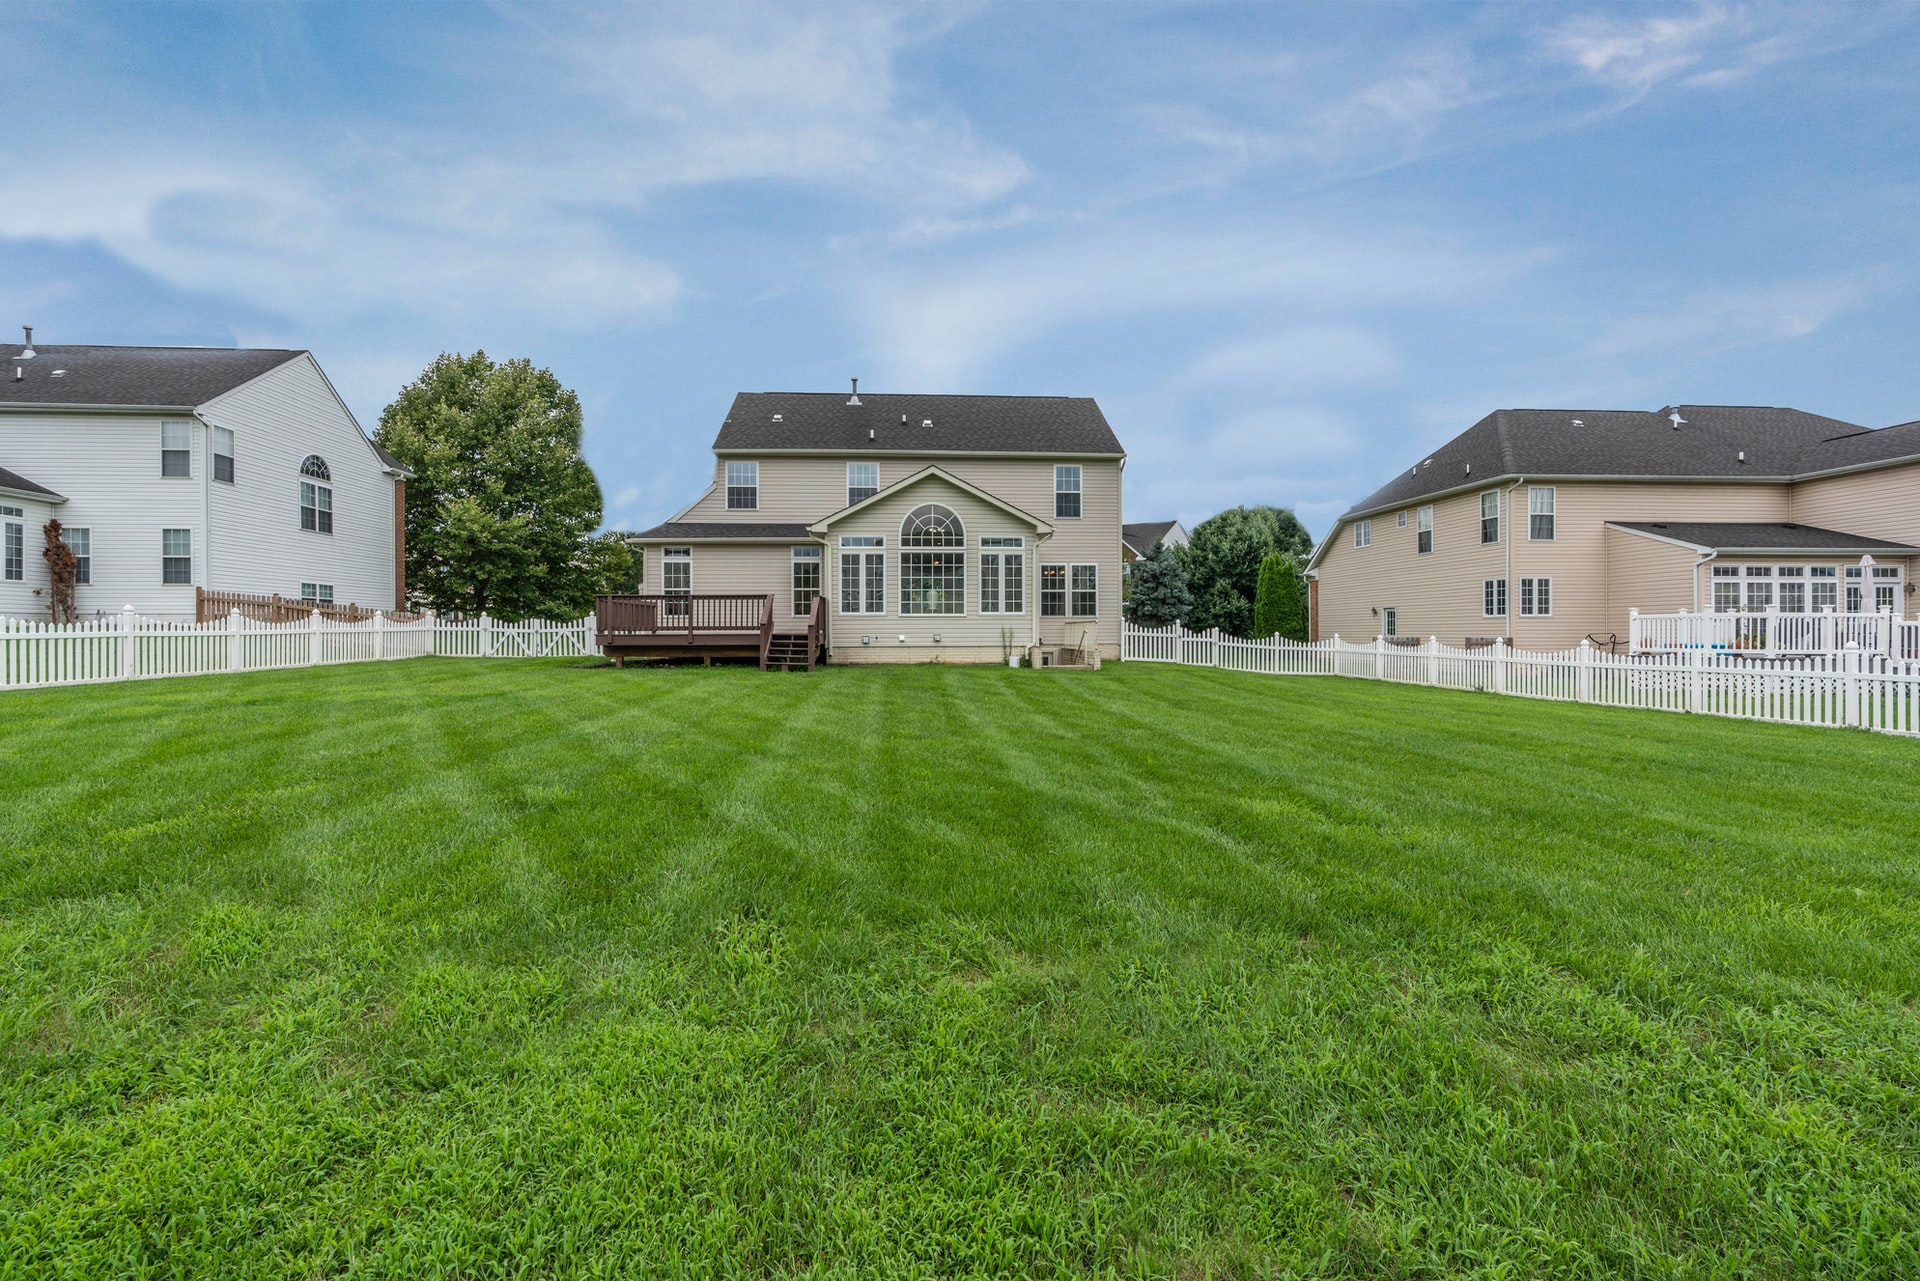 huis met grasveld